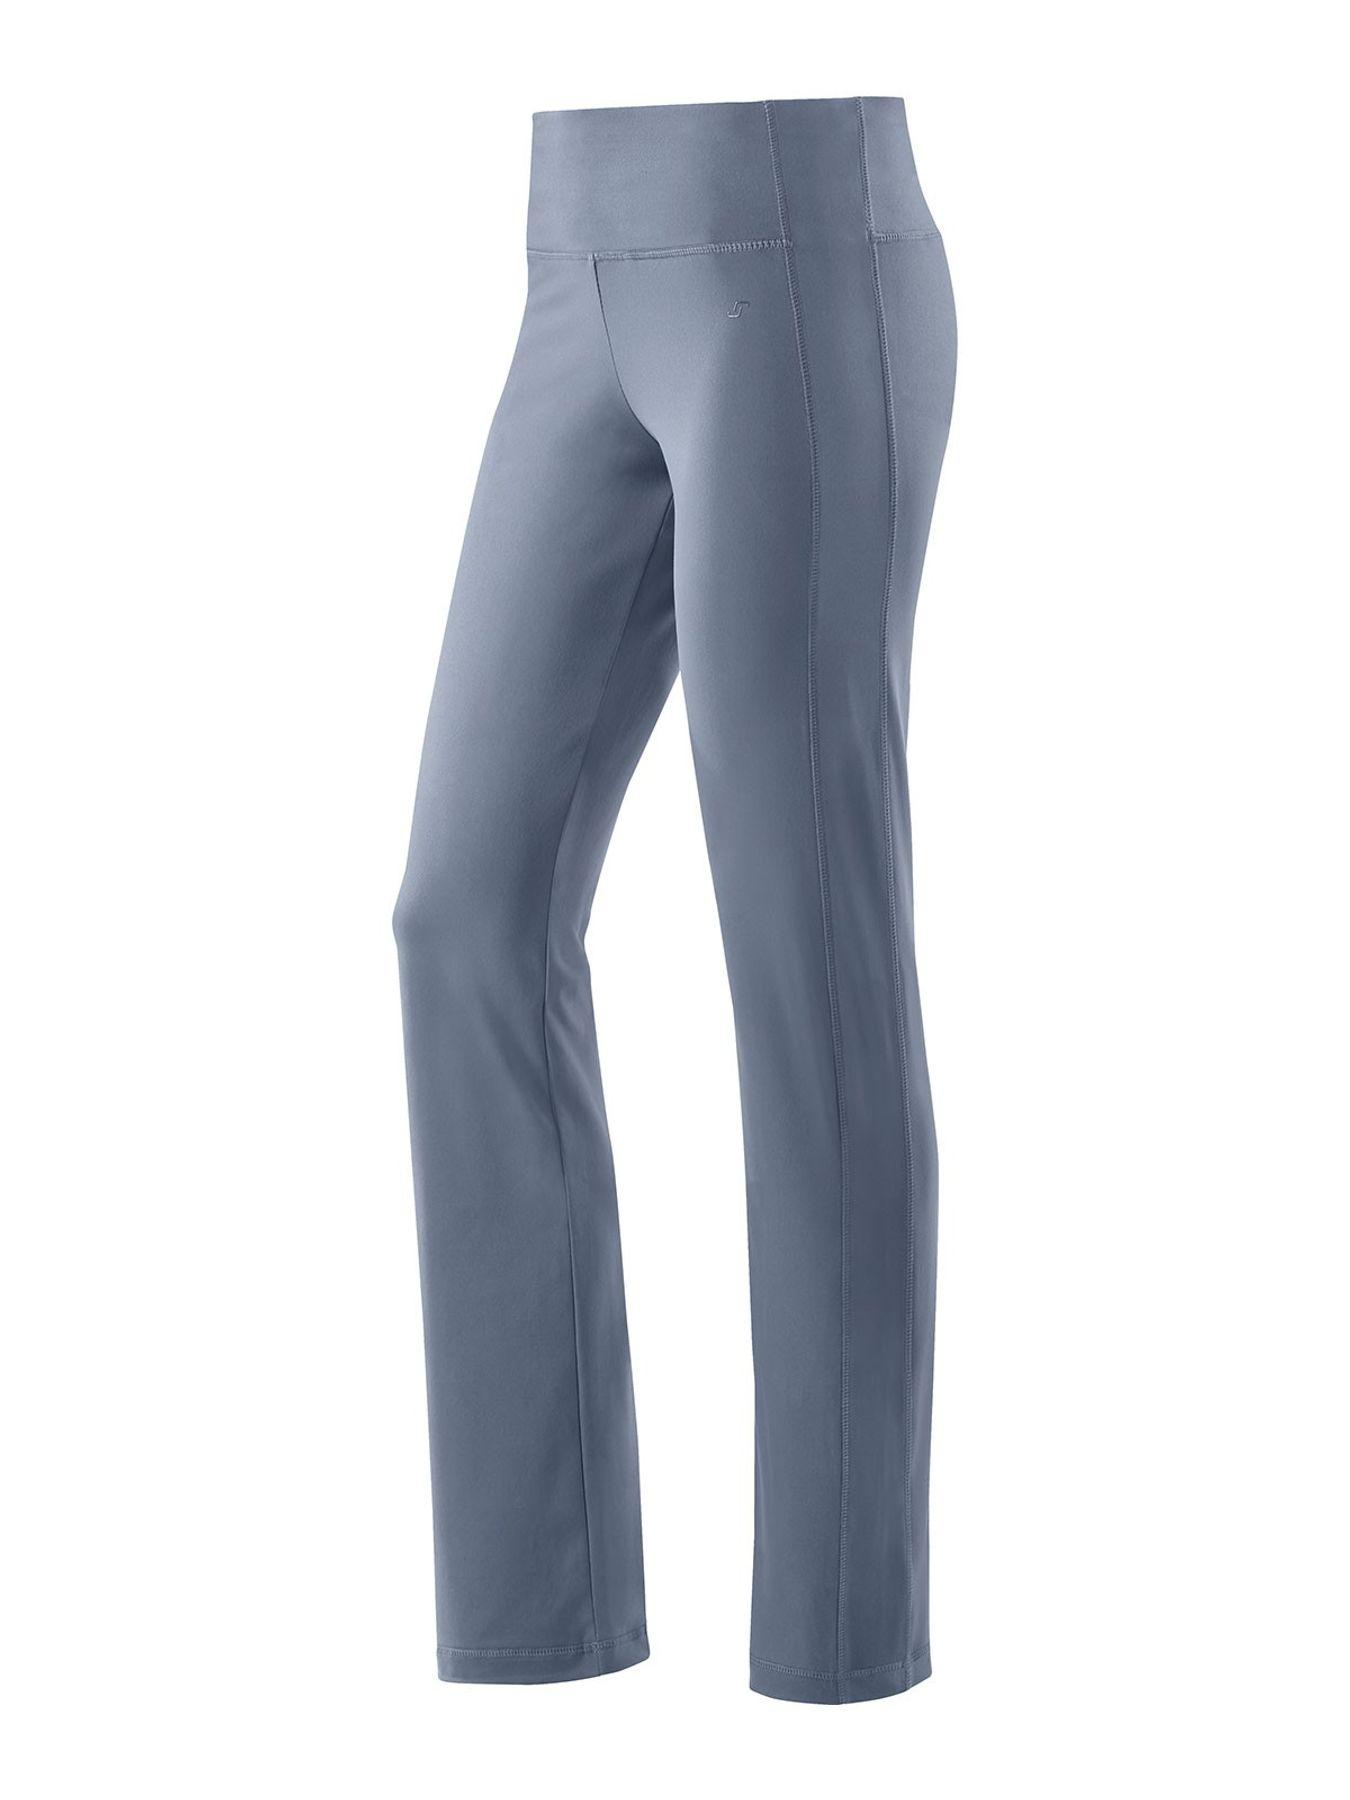 Joy - Bodyfit - Damen Sport Hose in verschiedenen Farben, Ester (30140) – Bild 6